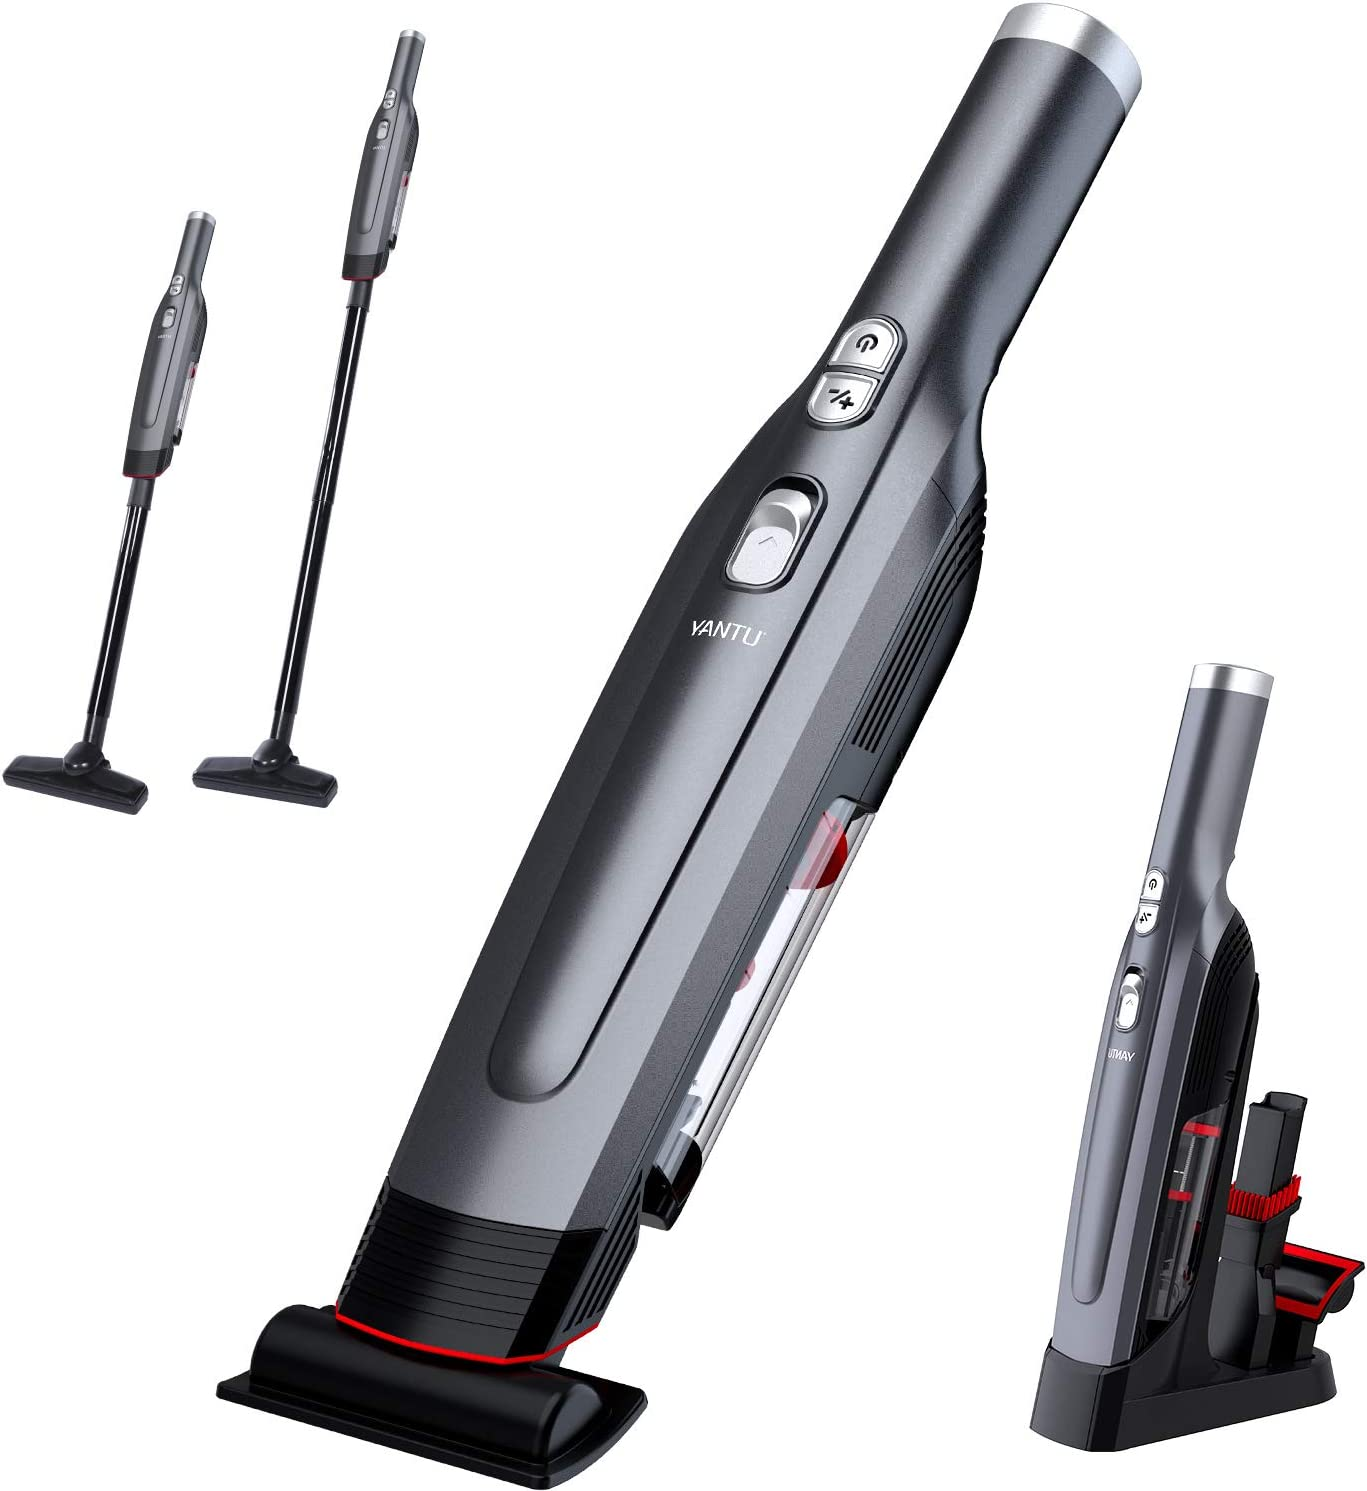 Handheld Vacuum Cleaner, YANTU Vacuum Cleaner Cordless Lightweight Powerful Suction Vacuum Cleaner